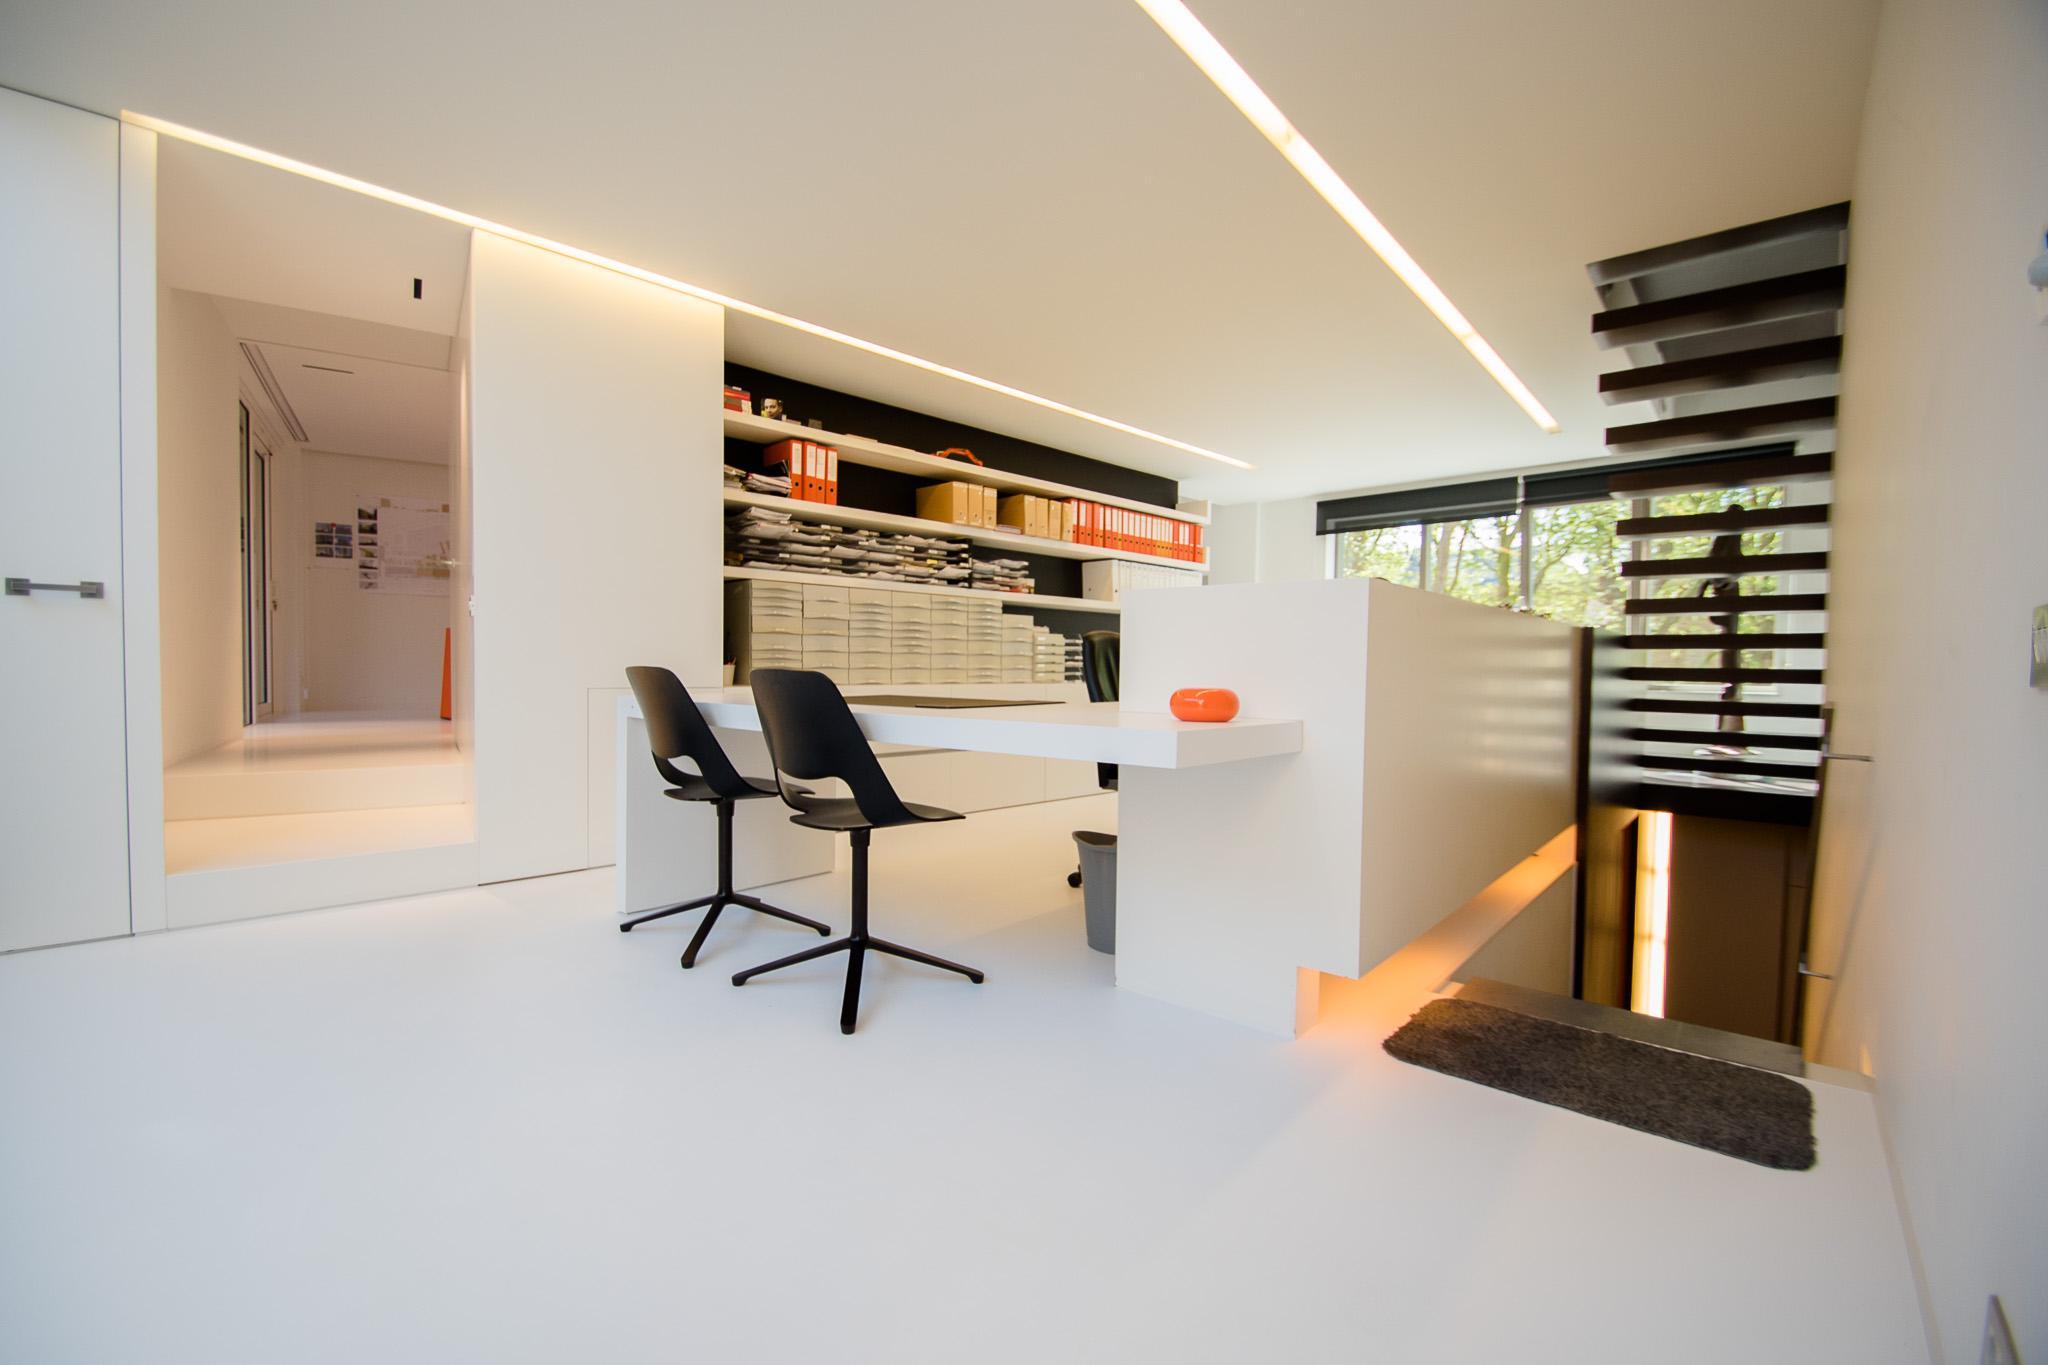 Gietvloer modern kantoor veurne stefaan holvoet kunstharsvloeren